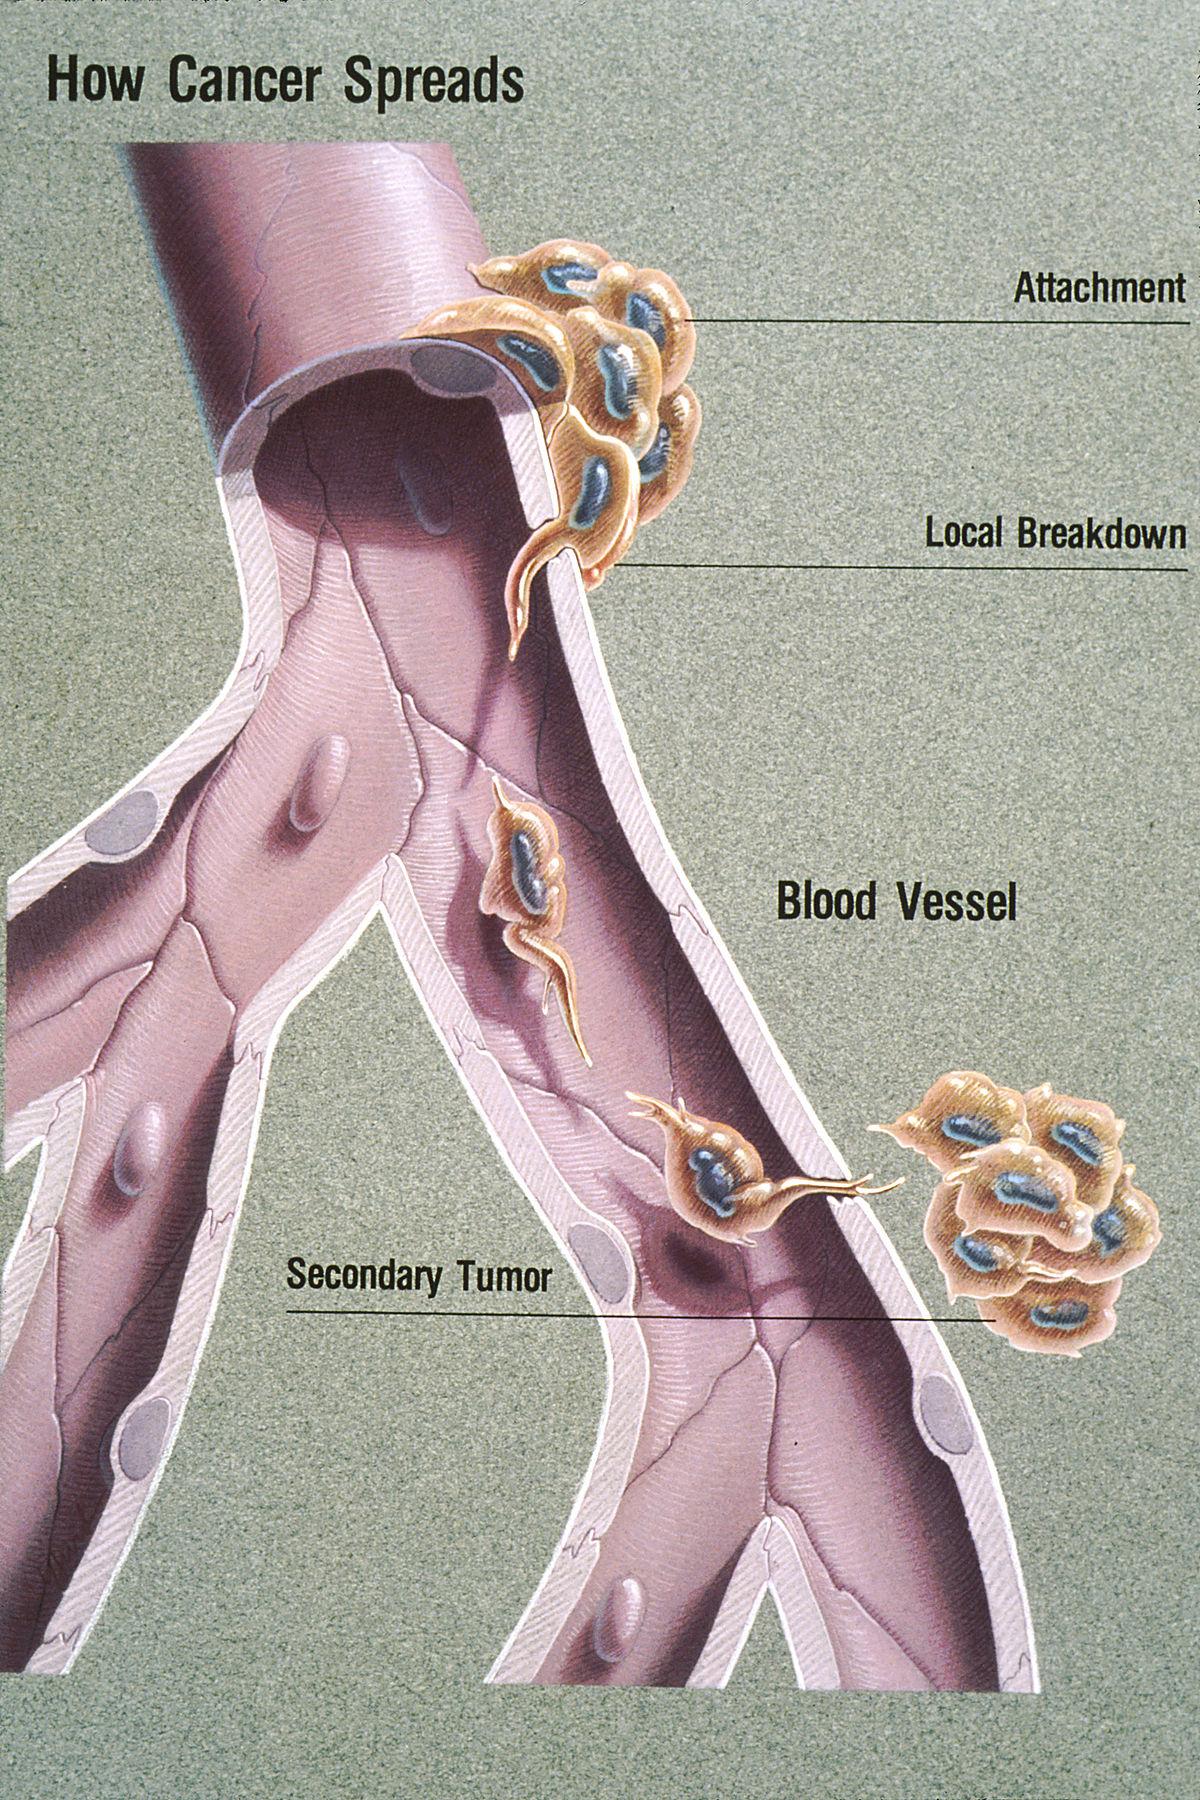 metastatic cancer disease